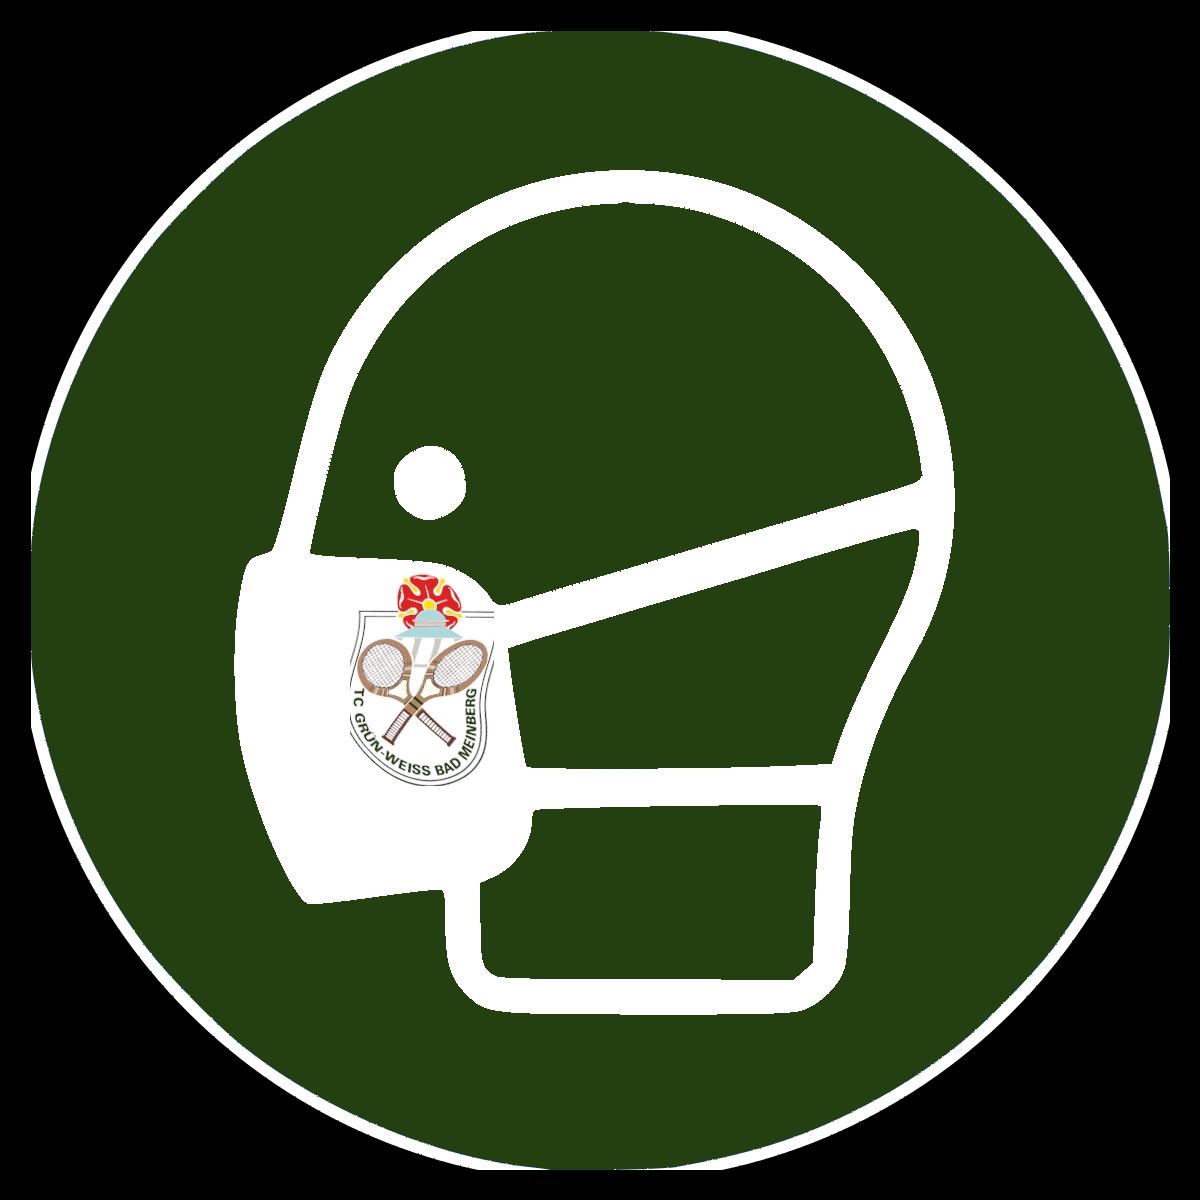 Mund-Nase-Schutz_TC-Logo